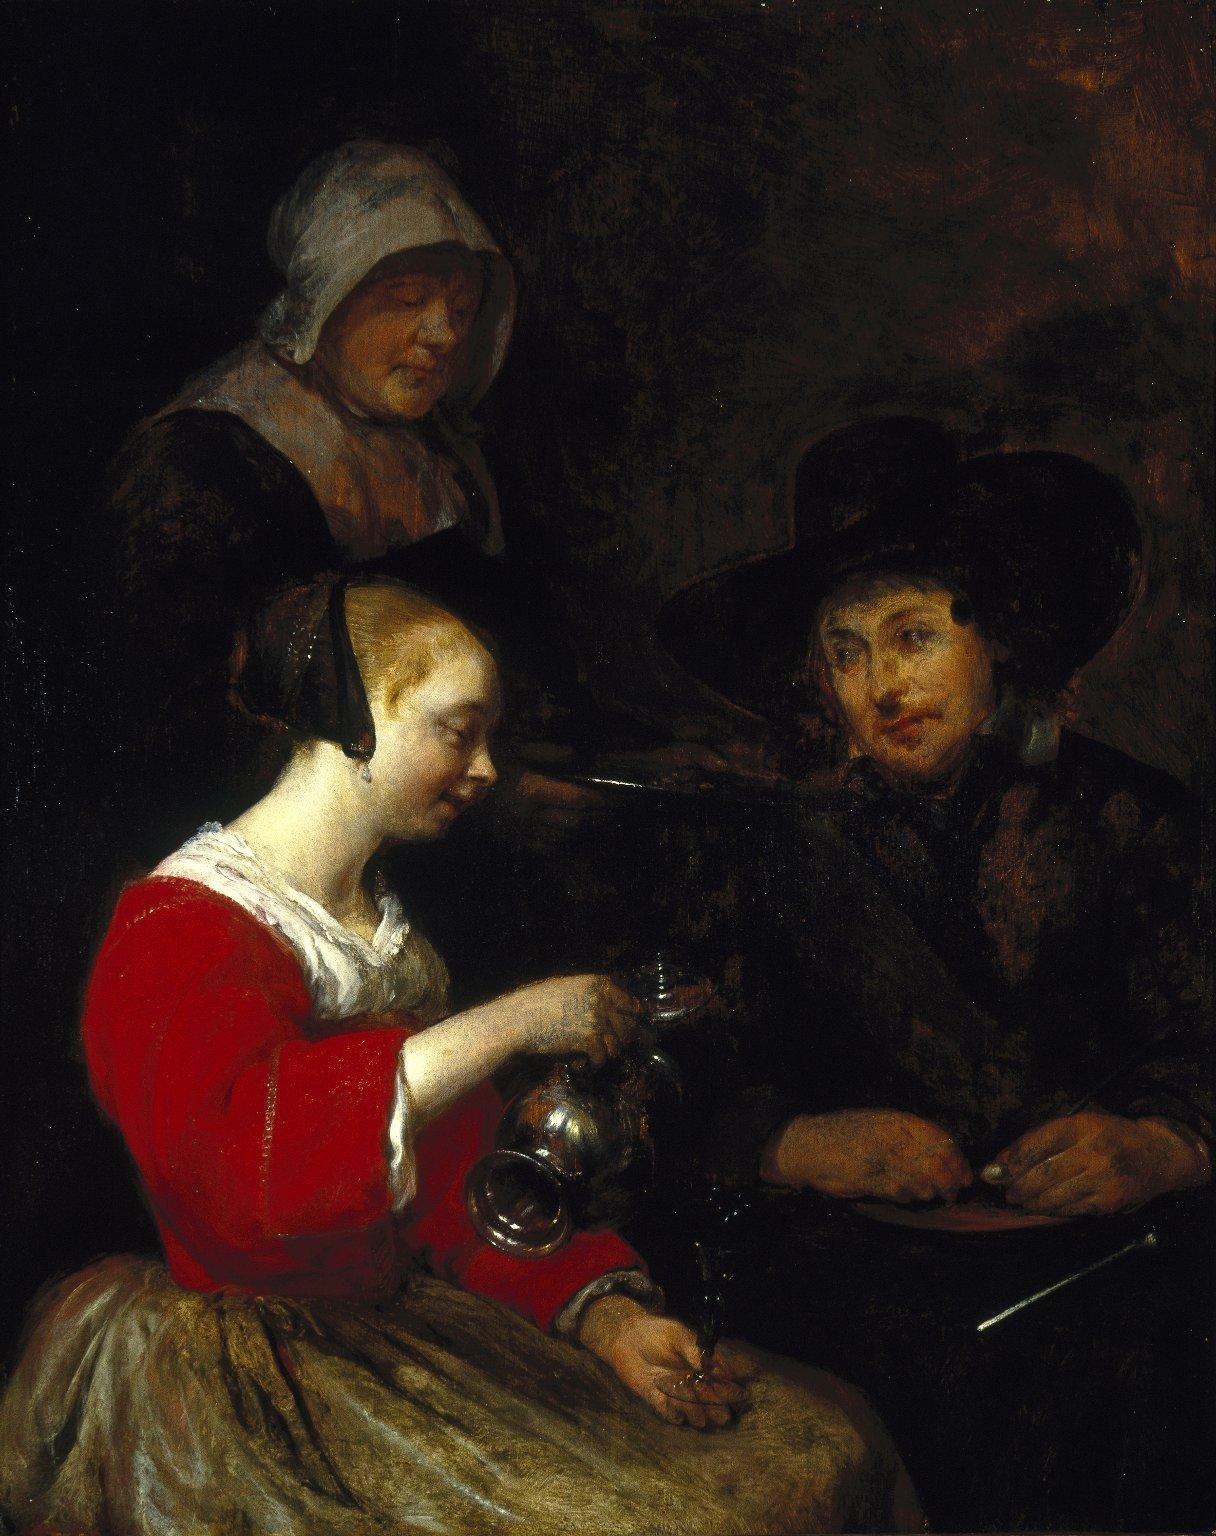 Gerard_ter_Borch 1650 ca Jeune_Hollandaise_versant_à_boire Brooklin Museum